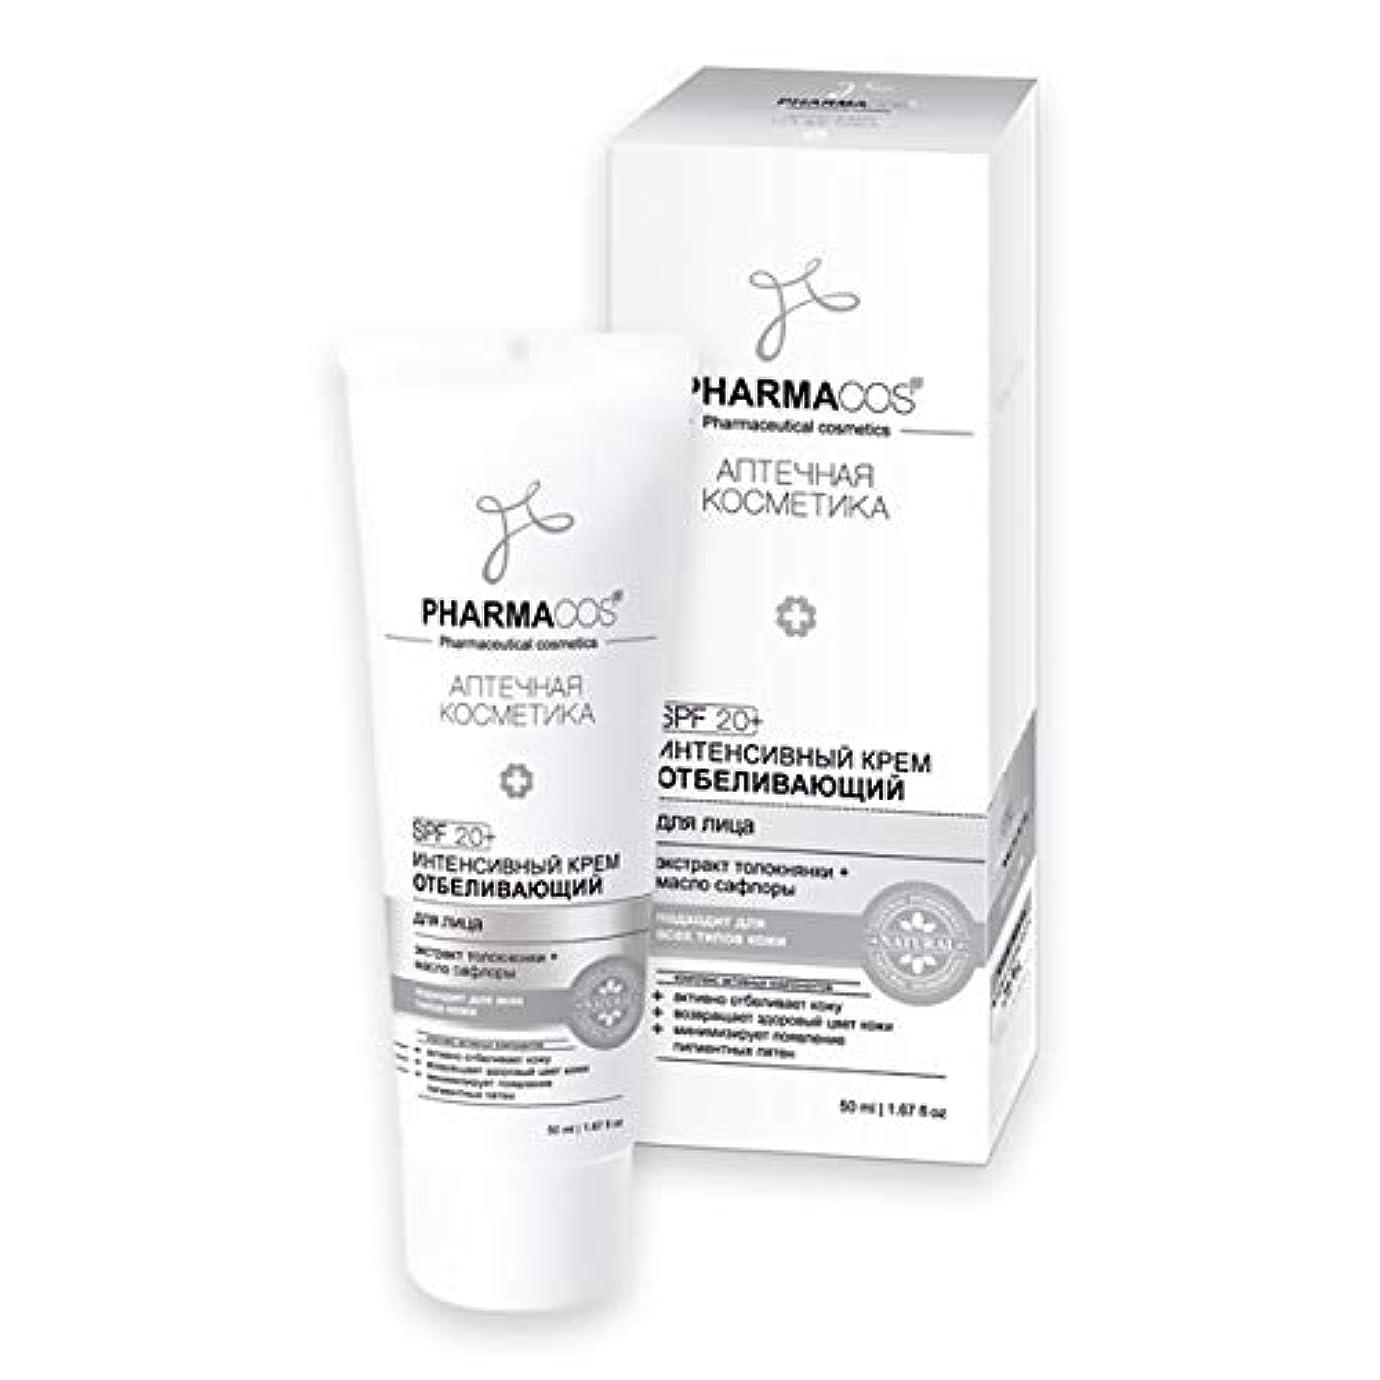 呼吸赤外線過去Bielita & Vitex Pharmacos Line   Intensive Whitening Facial Cream   SPF 20   Lumiskin   Arctostaphylos   Carthamus...